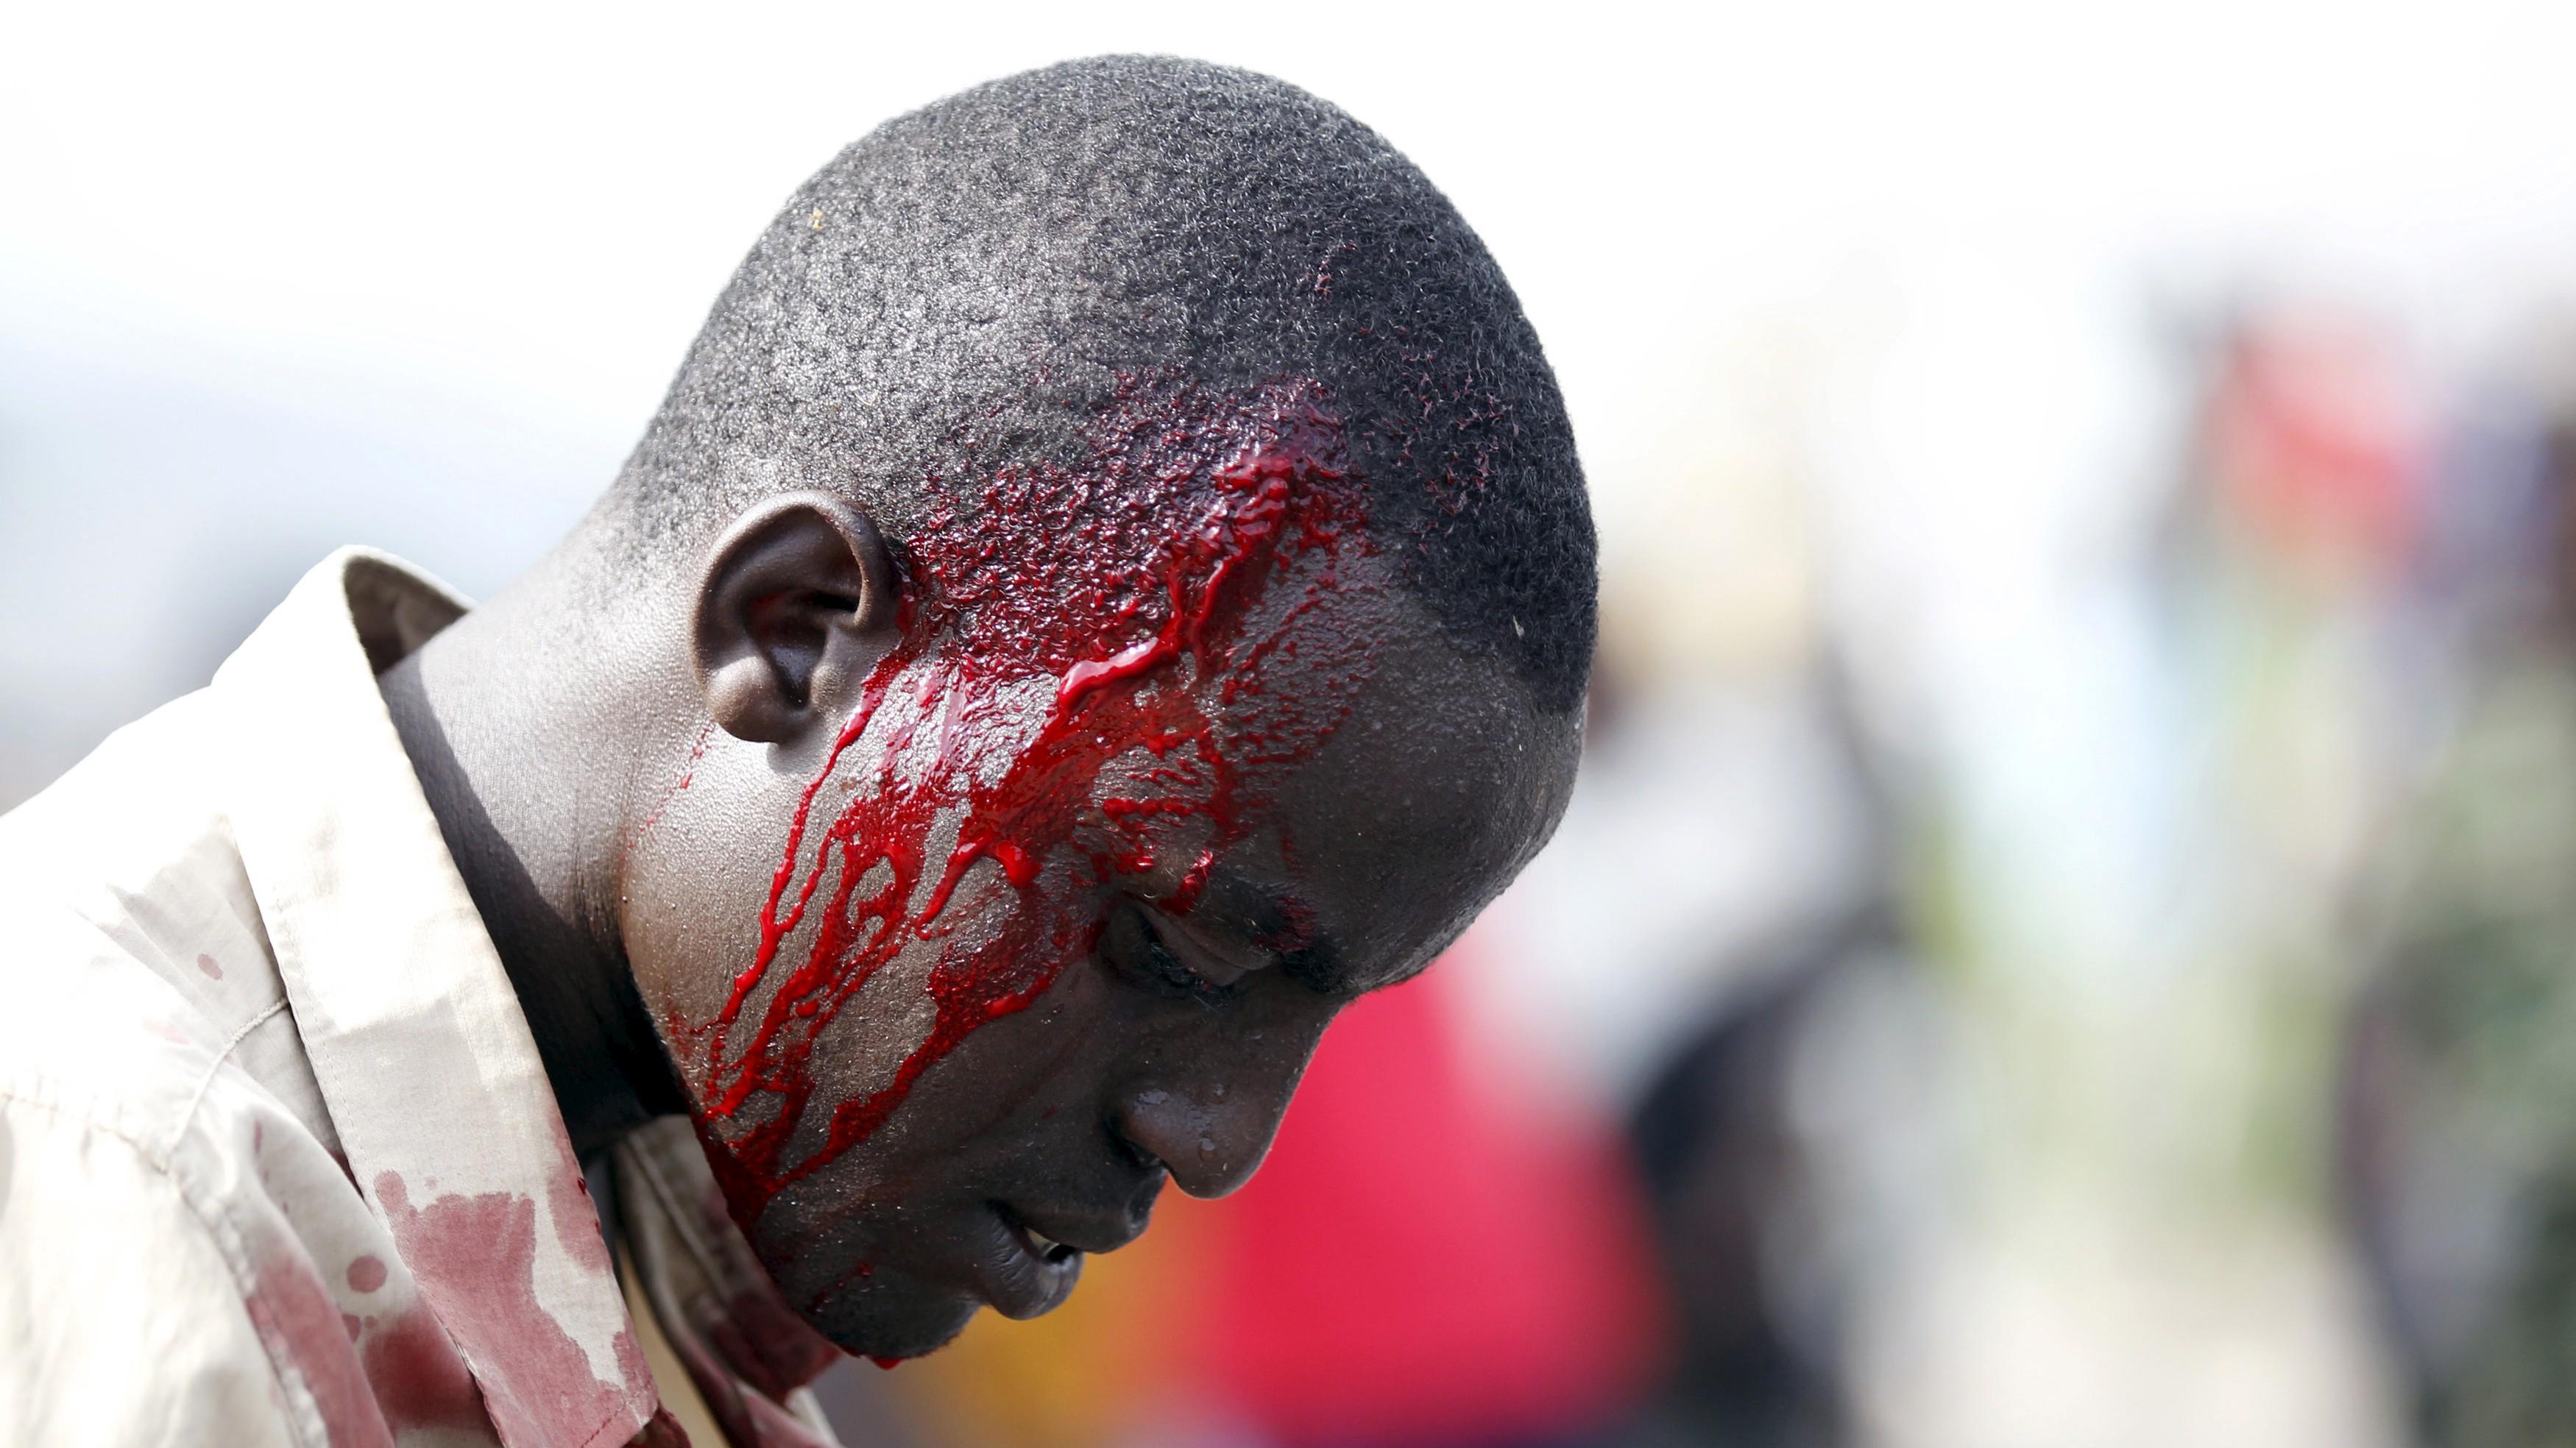 Burundi emerged from a brutal, 13-year war in 2006.